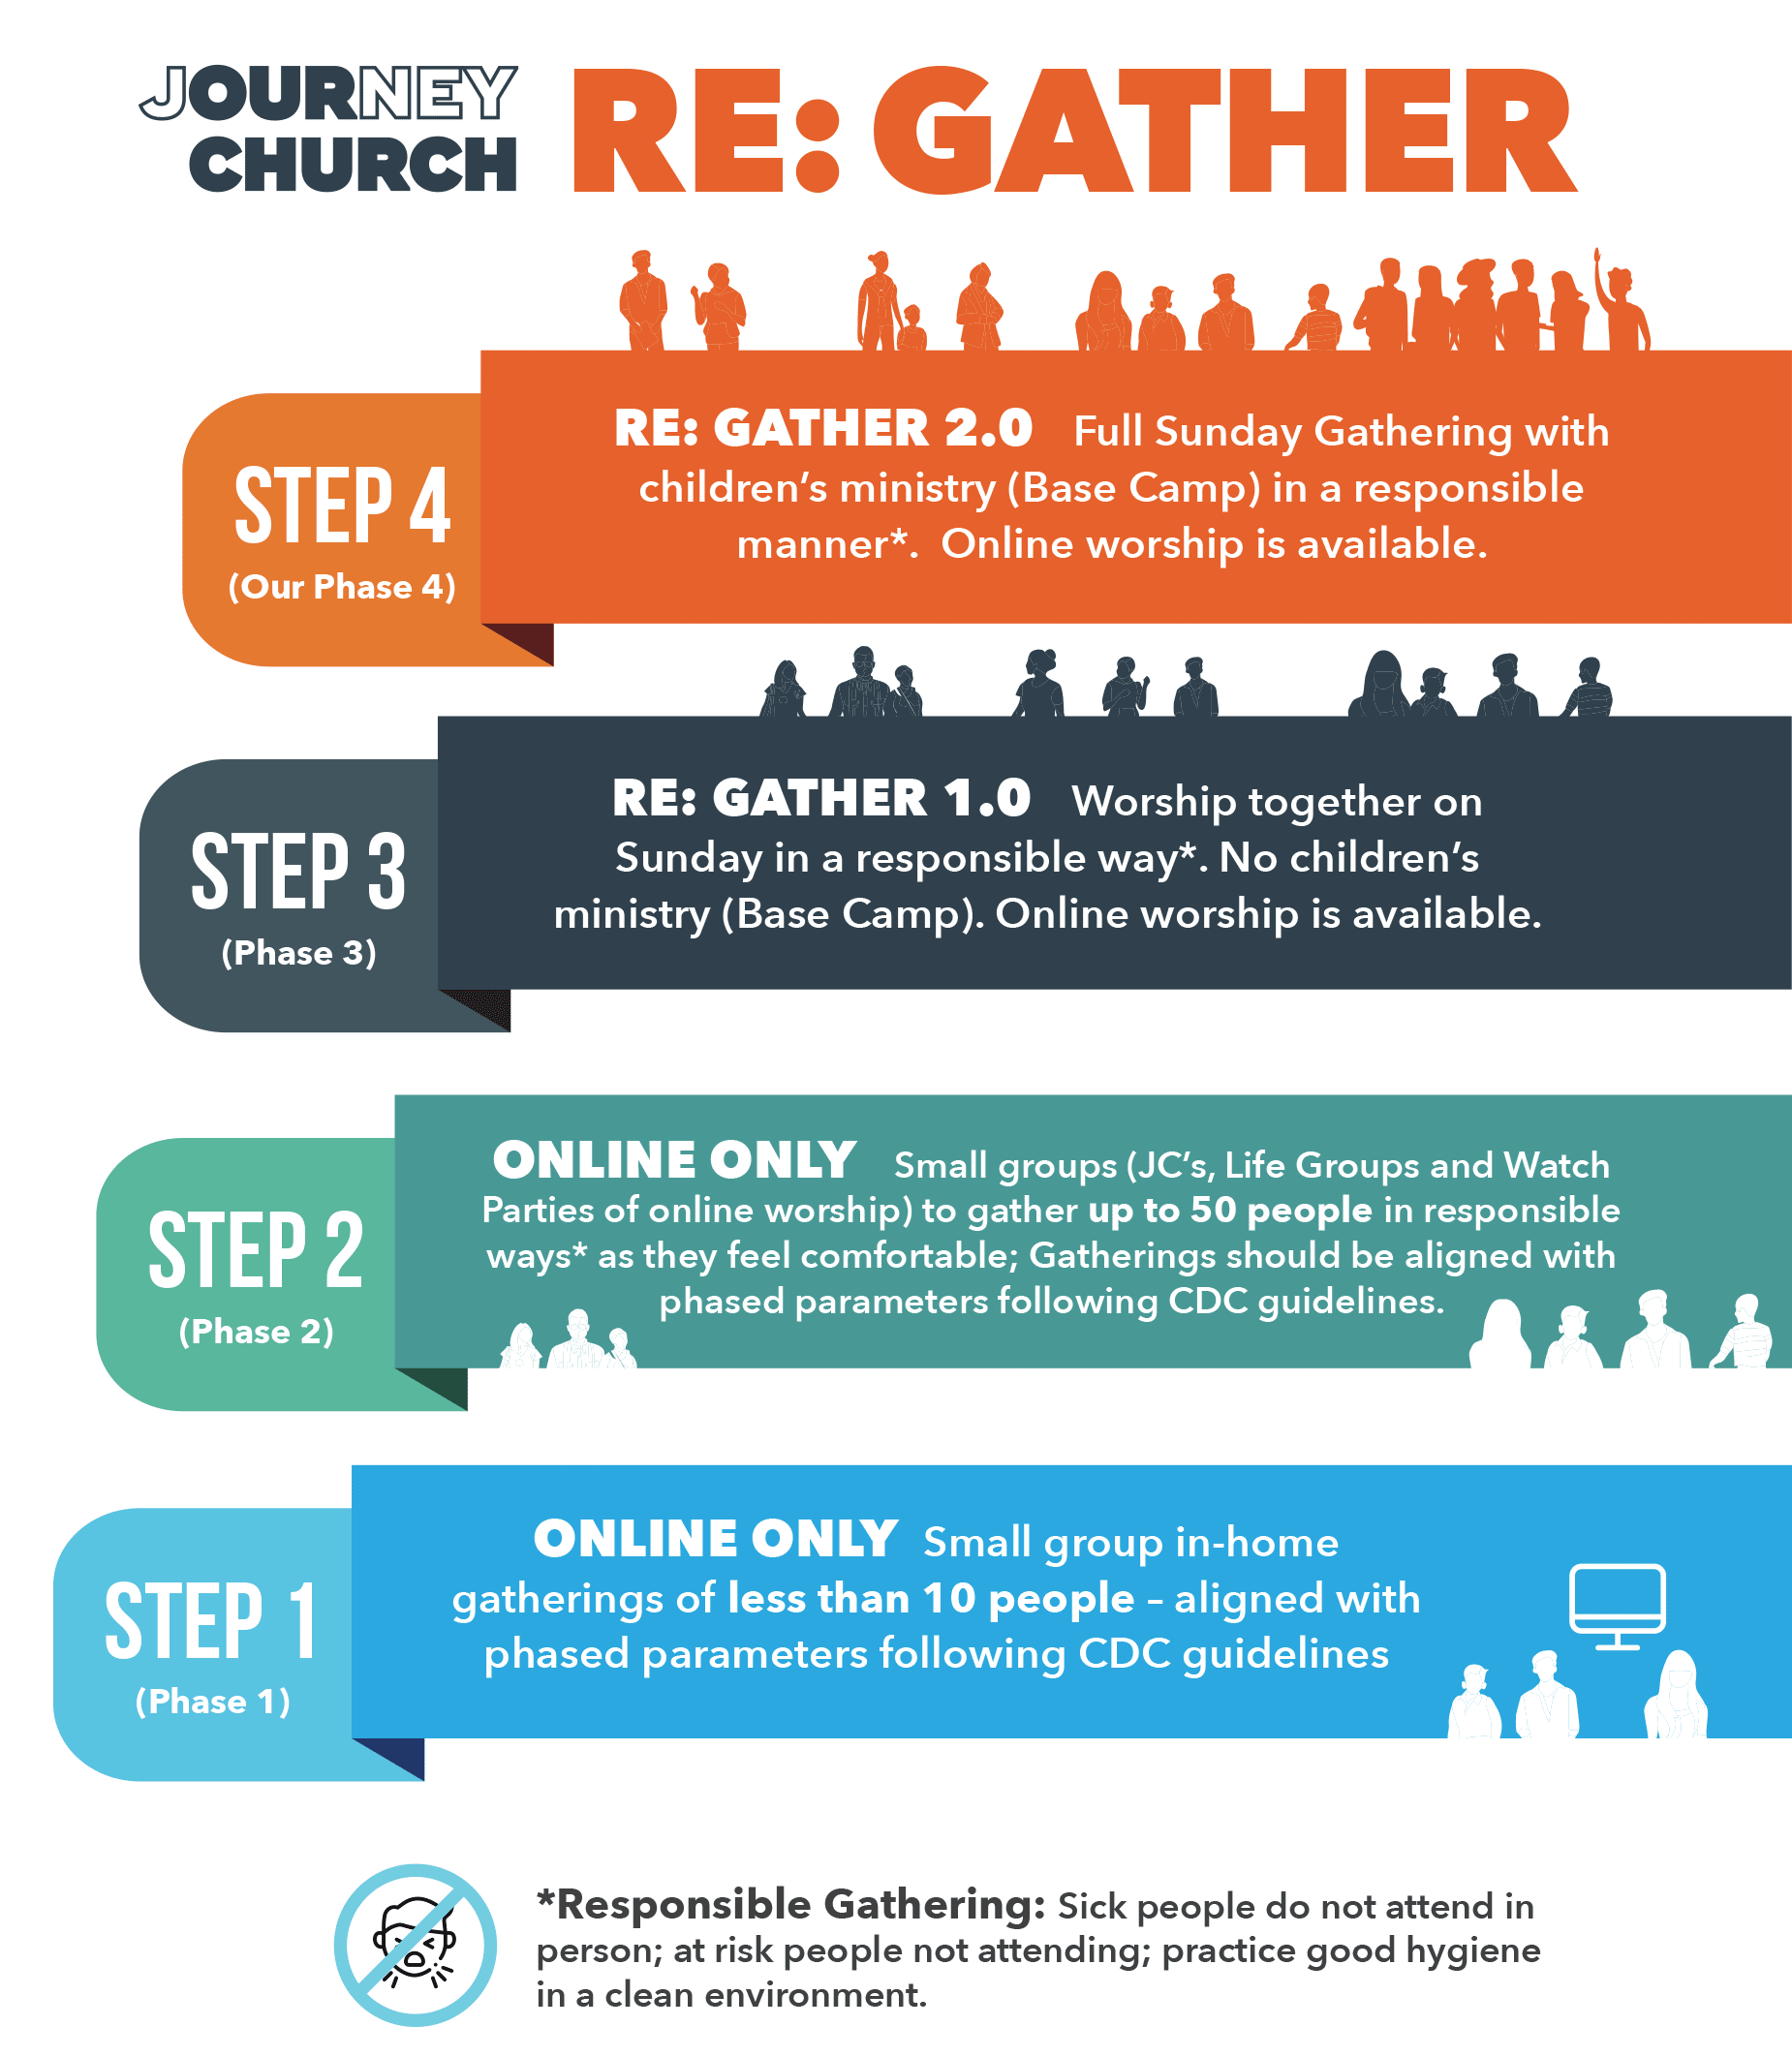 Journey Church Re: Gather